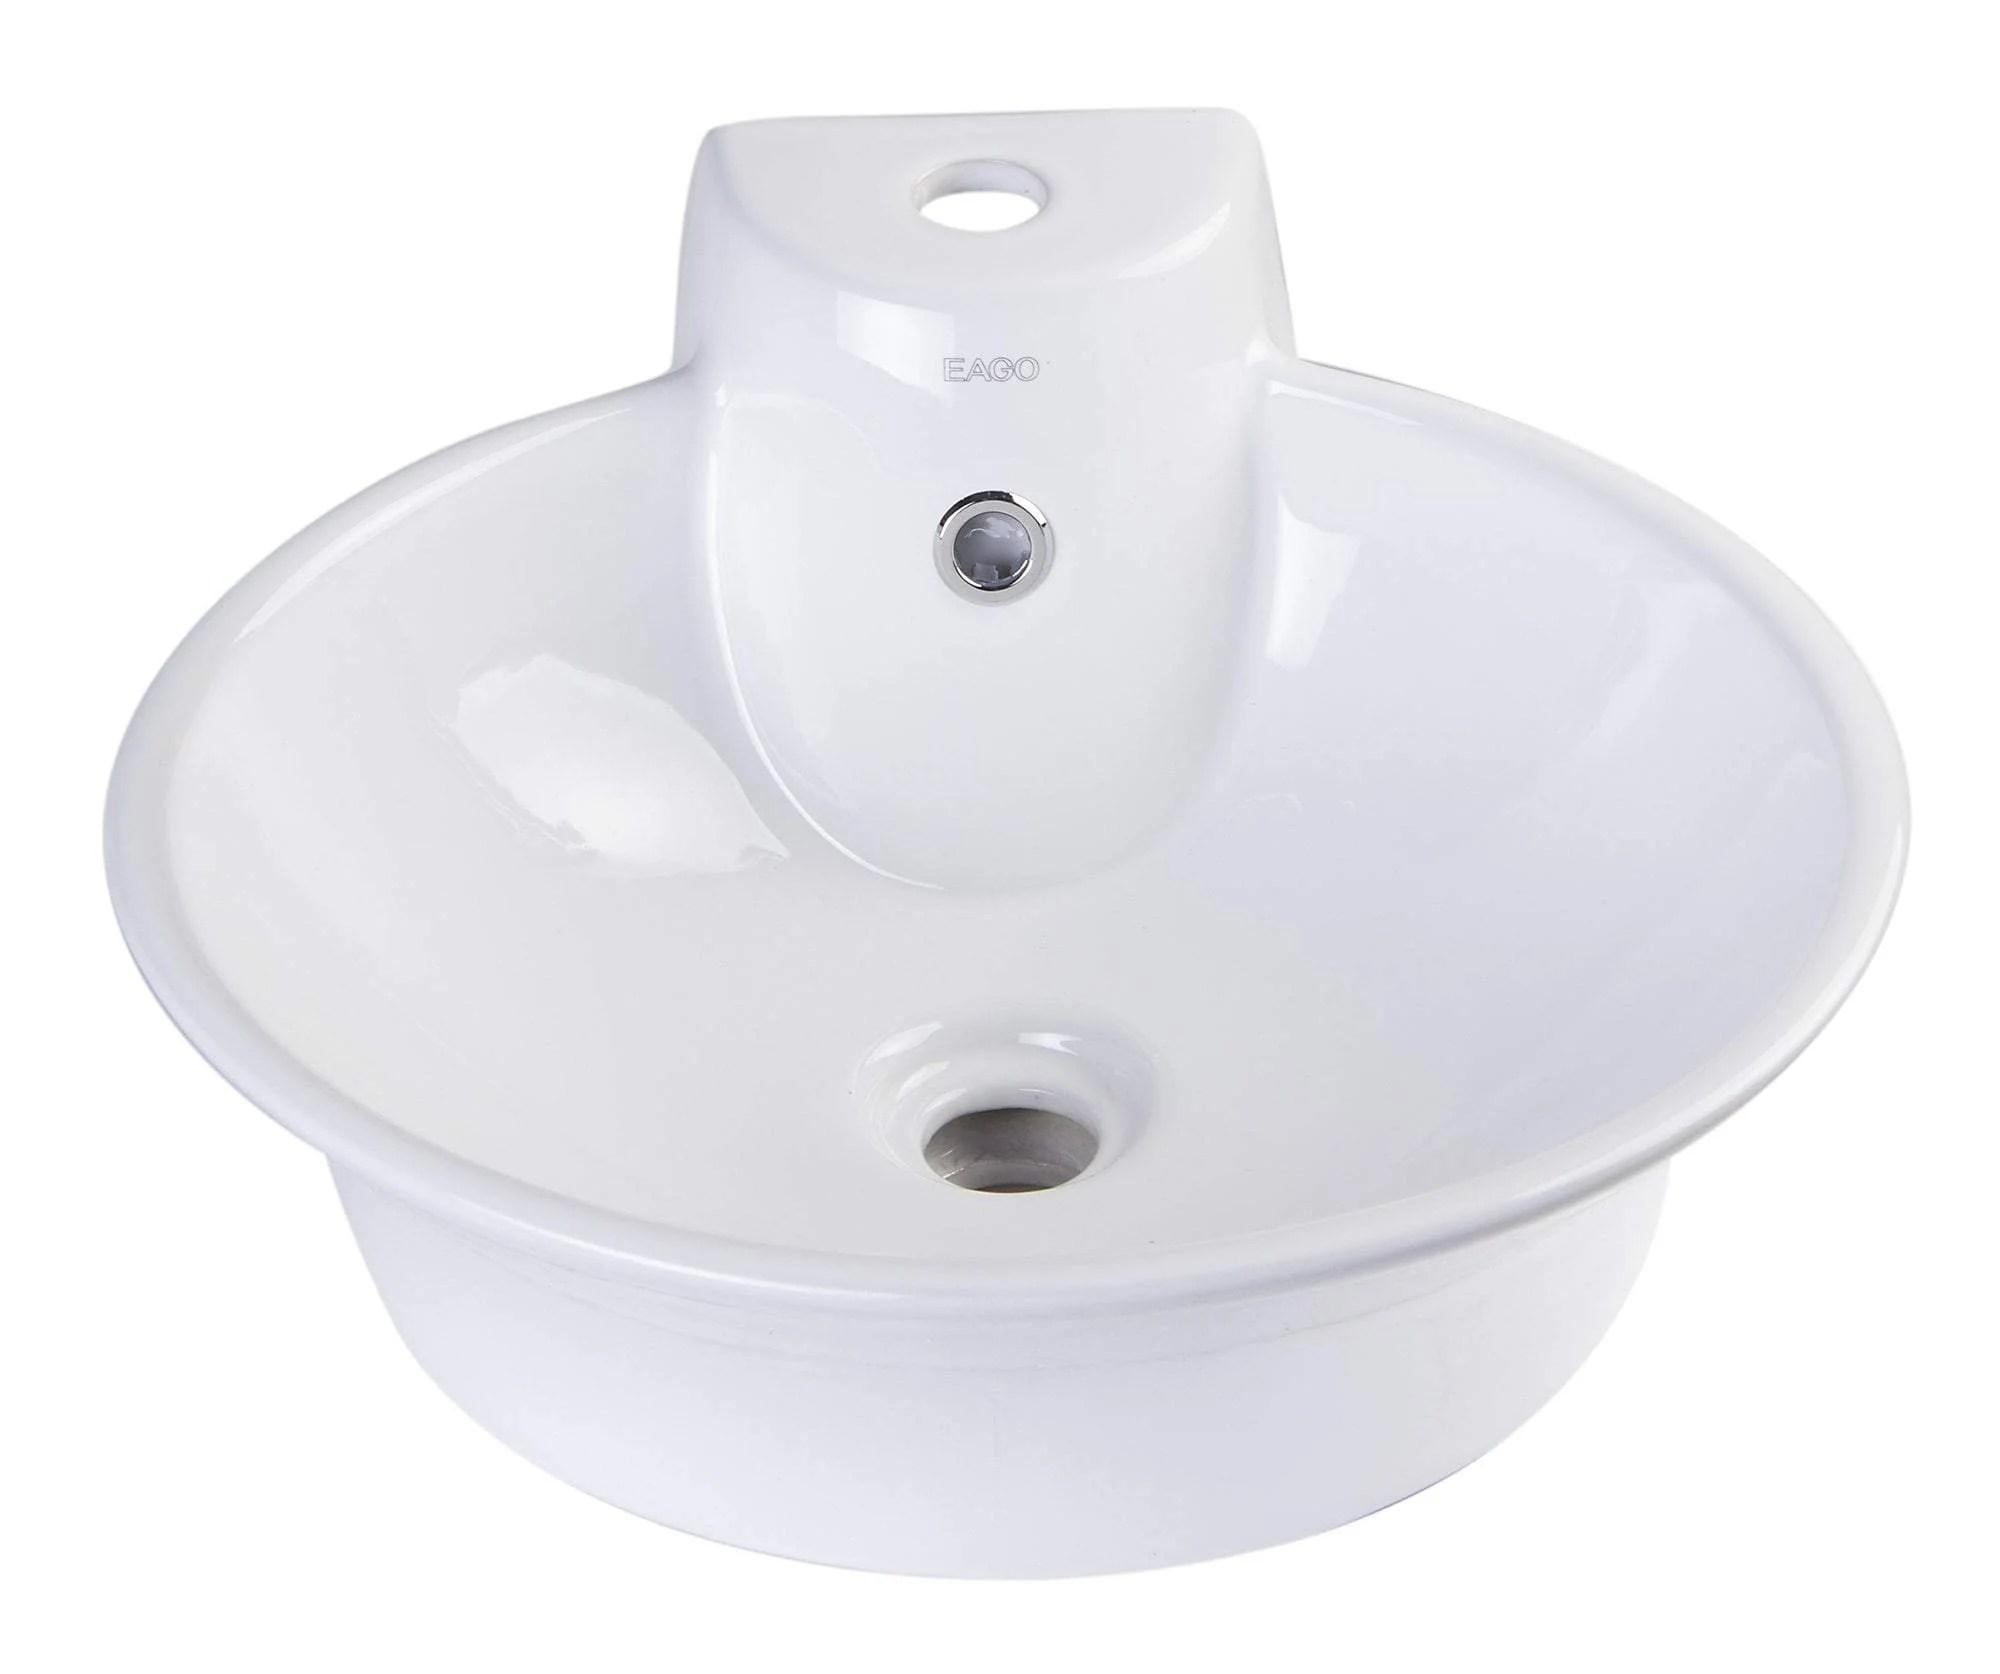 eago ba121 round ceramic above mount bath vessel sink with single fauc luxury bath collection